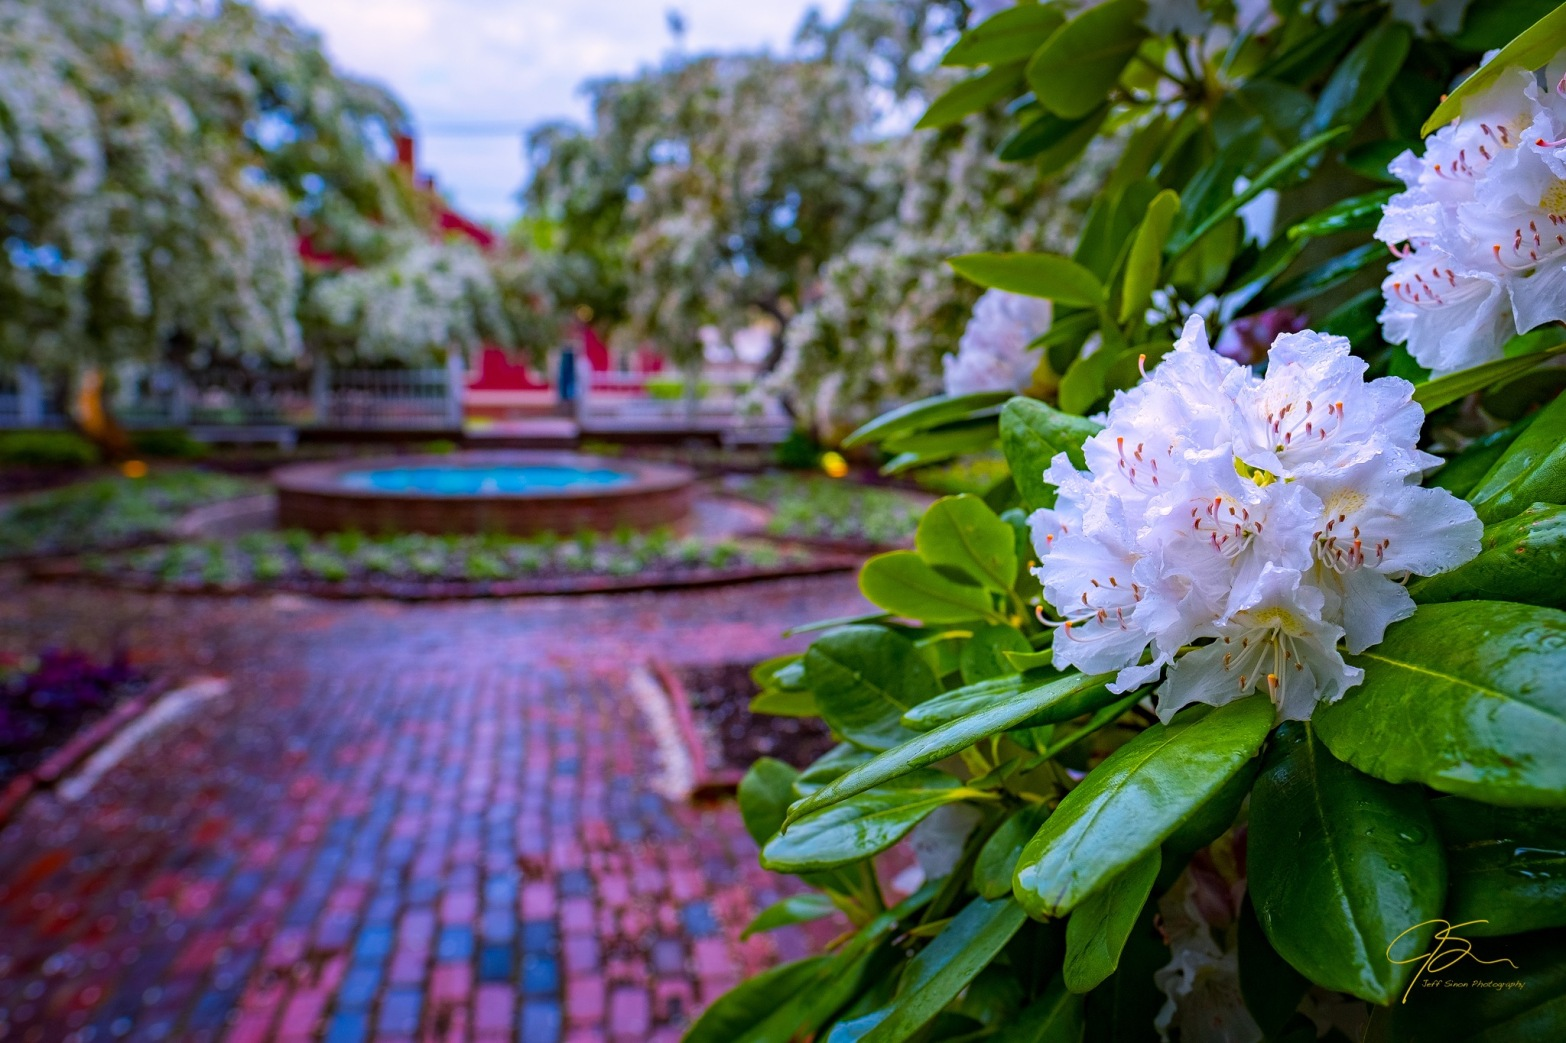 white rhododendron flower and cherry blossoms, prescott park gardens